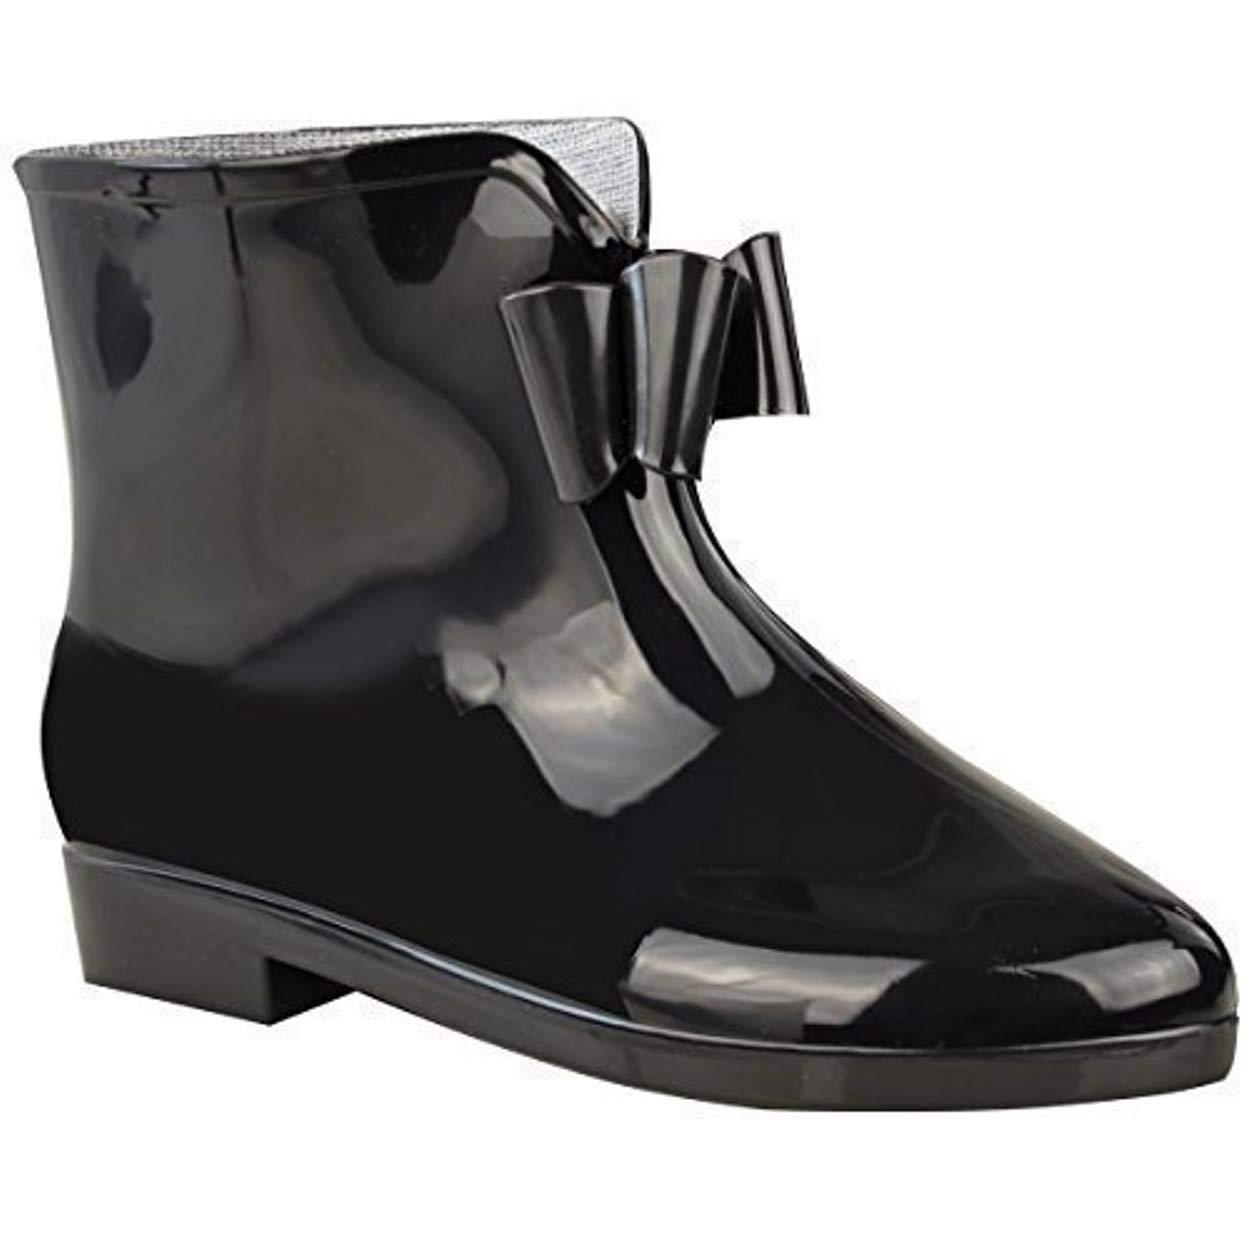 Womens Black Wellies Ladies New Bow Wellington Ankle Snow RAIN Boots